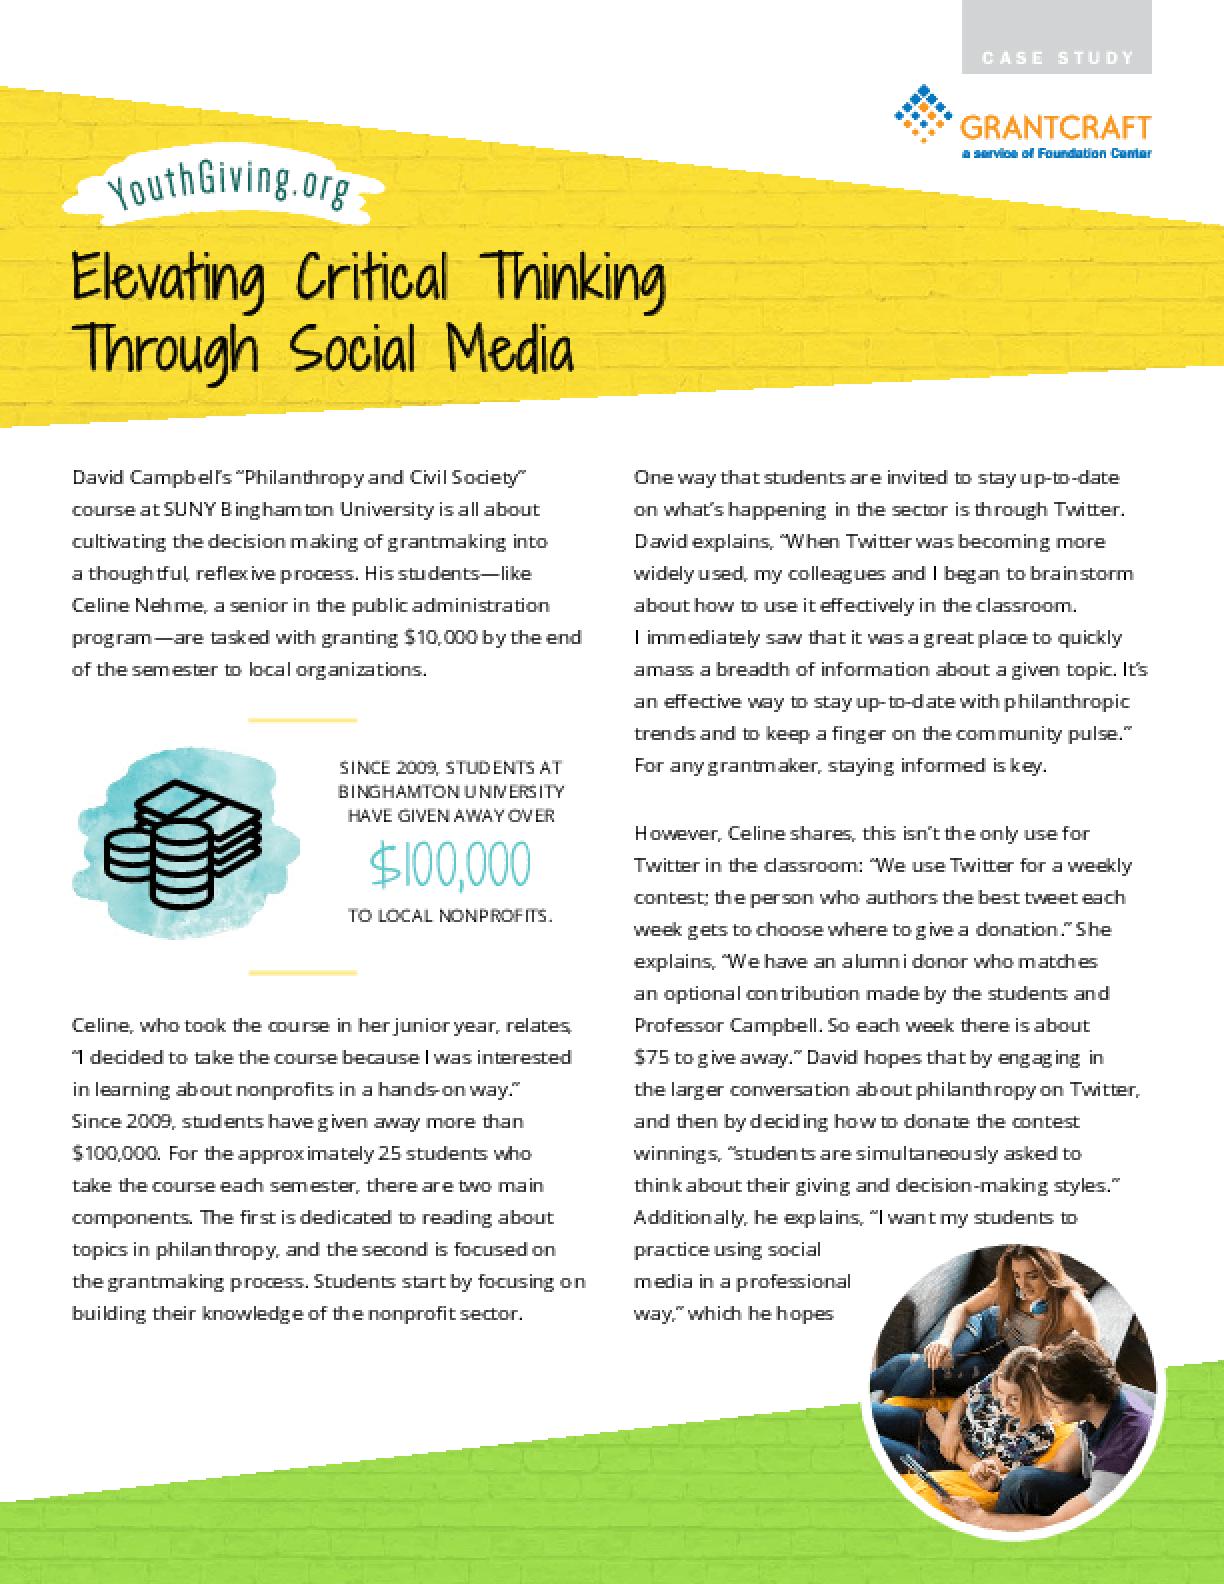 Elevating Critical Thinking Through Social Media